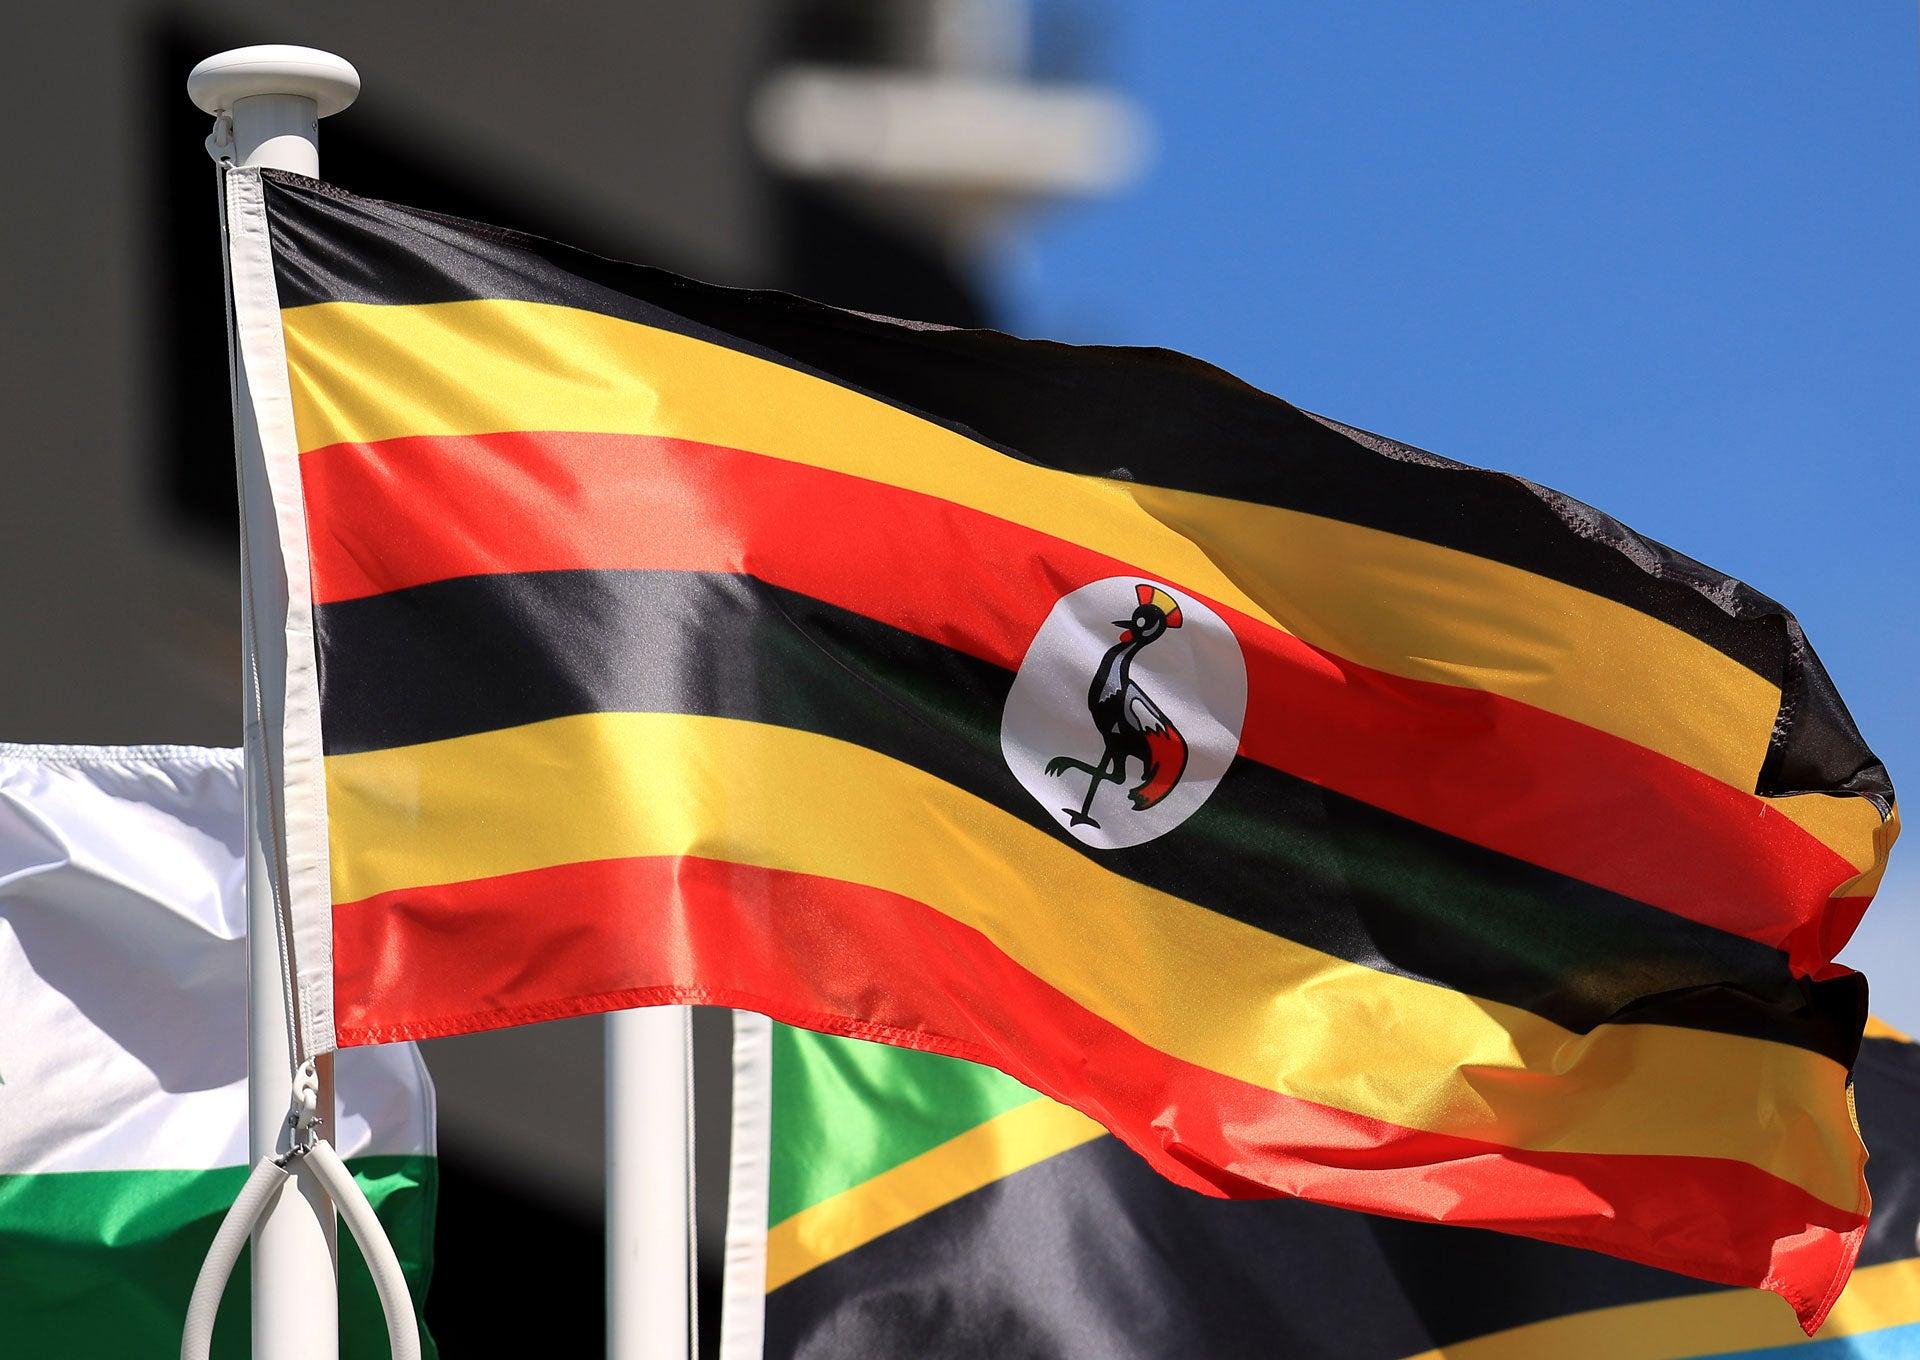 Uganda: Harassment of Civil Society Groups